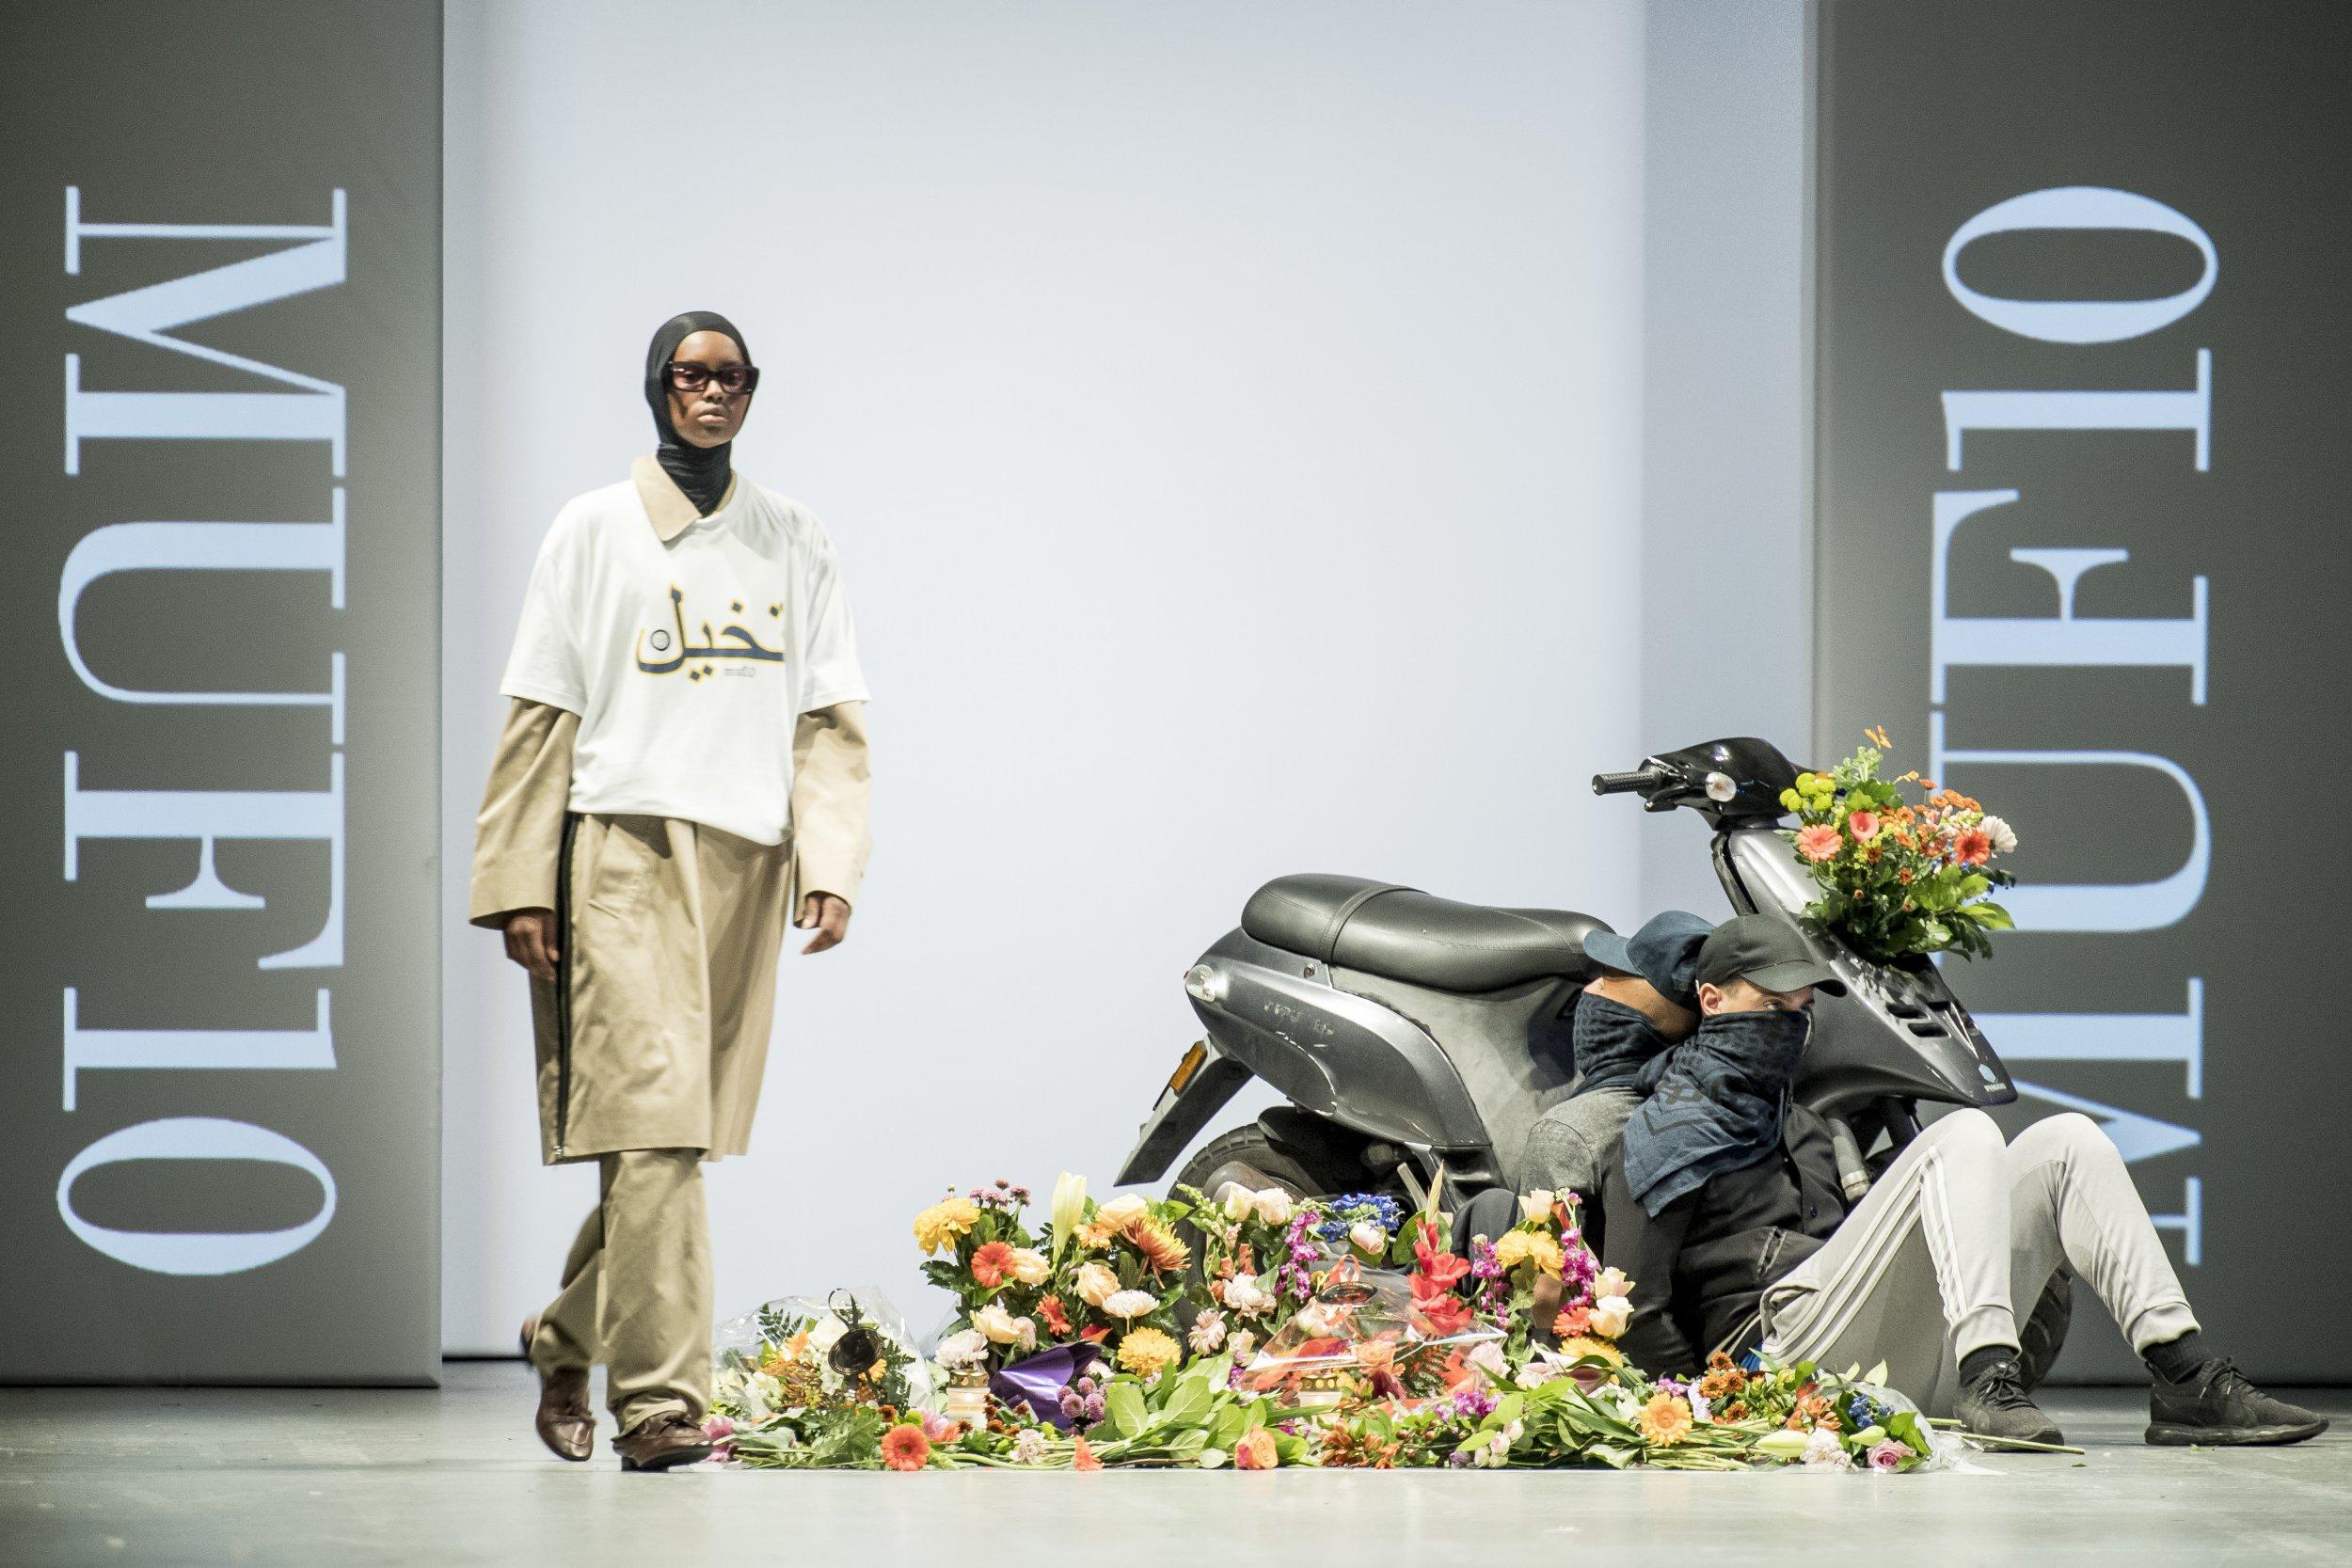 Danish designer puts on fashion show protesting burka ban